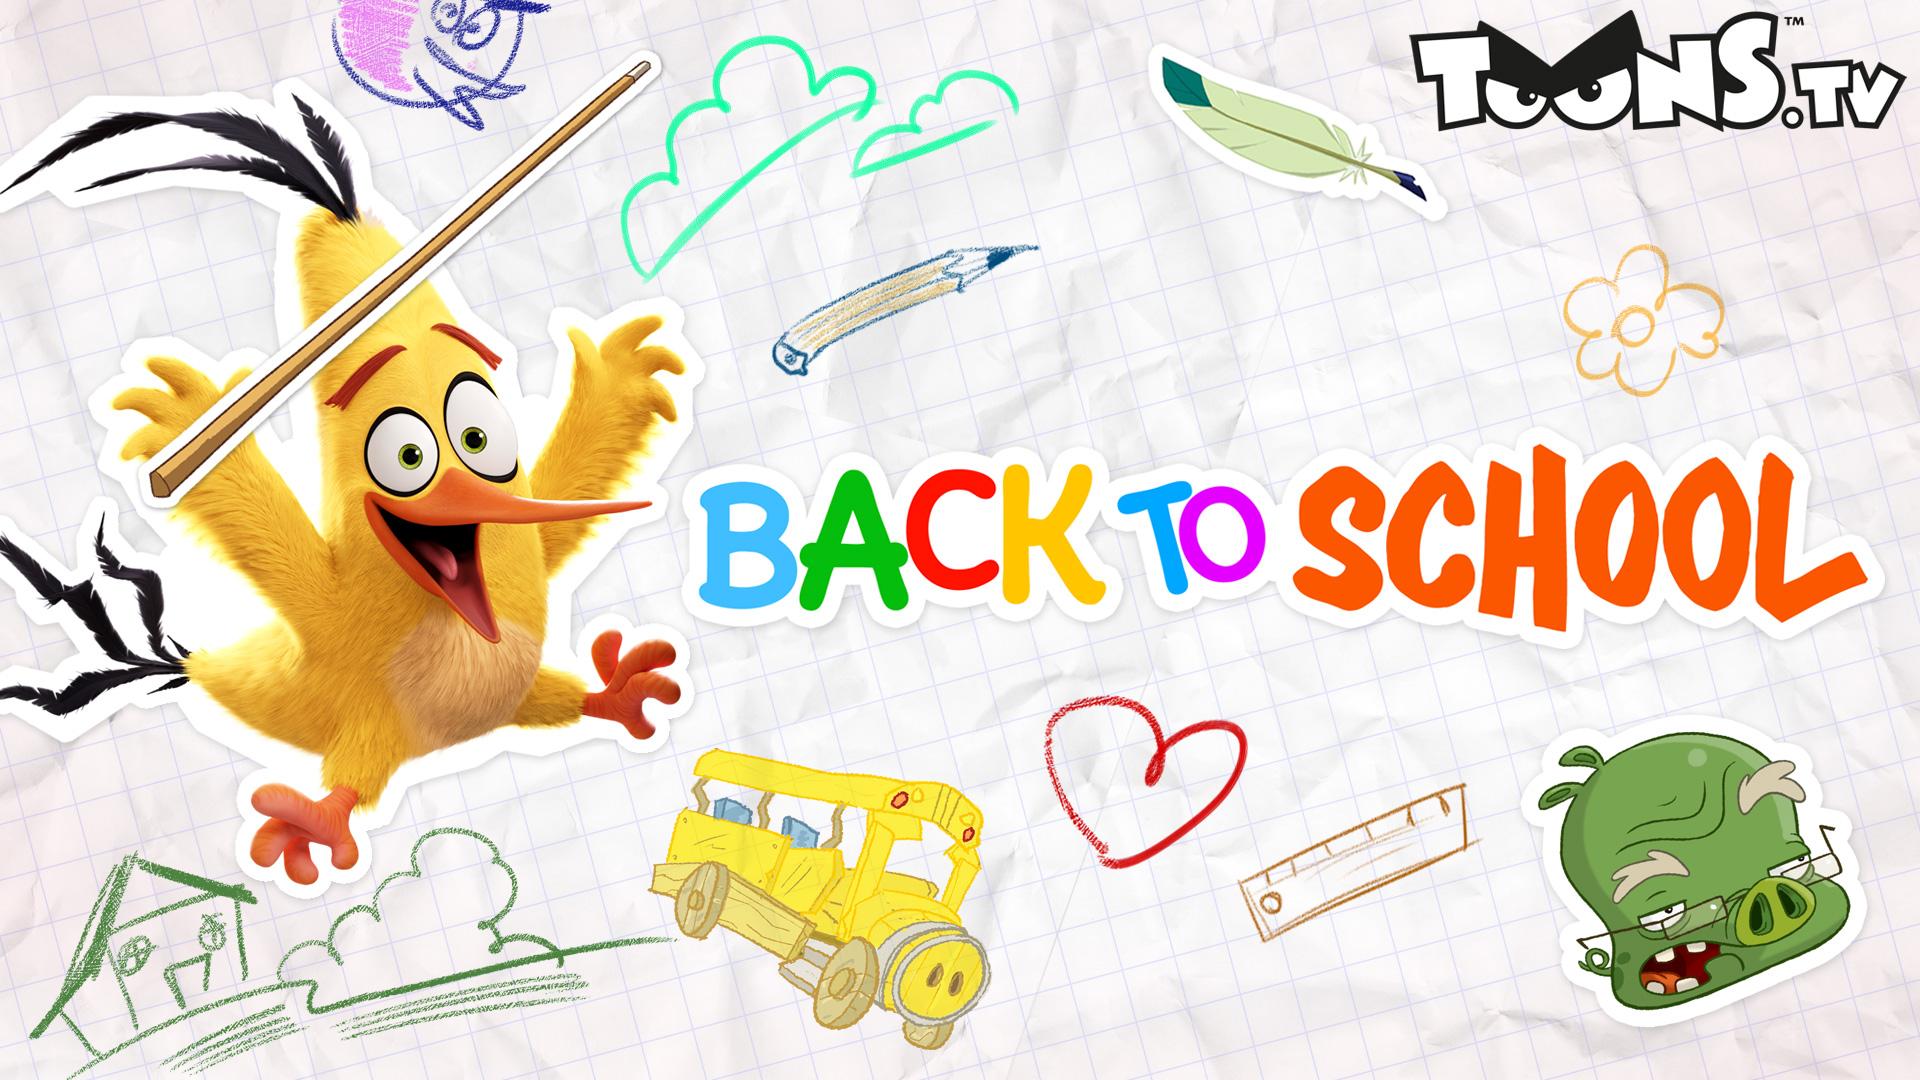 backtoschool_some_1920x1080